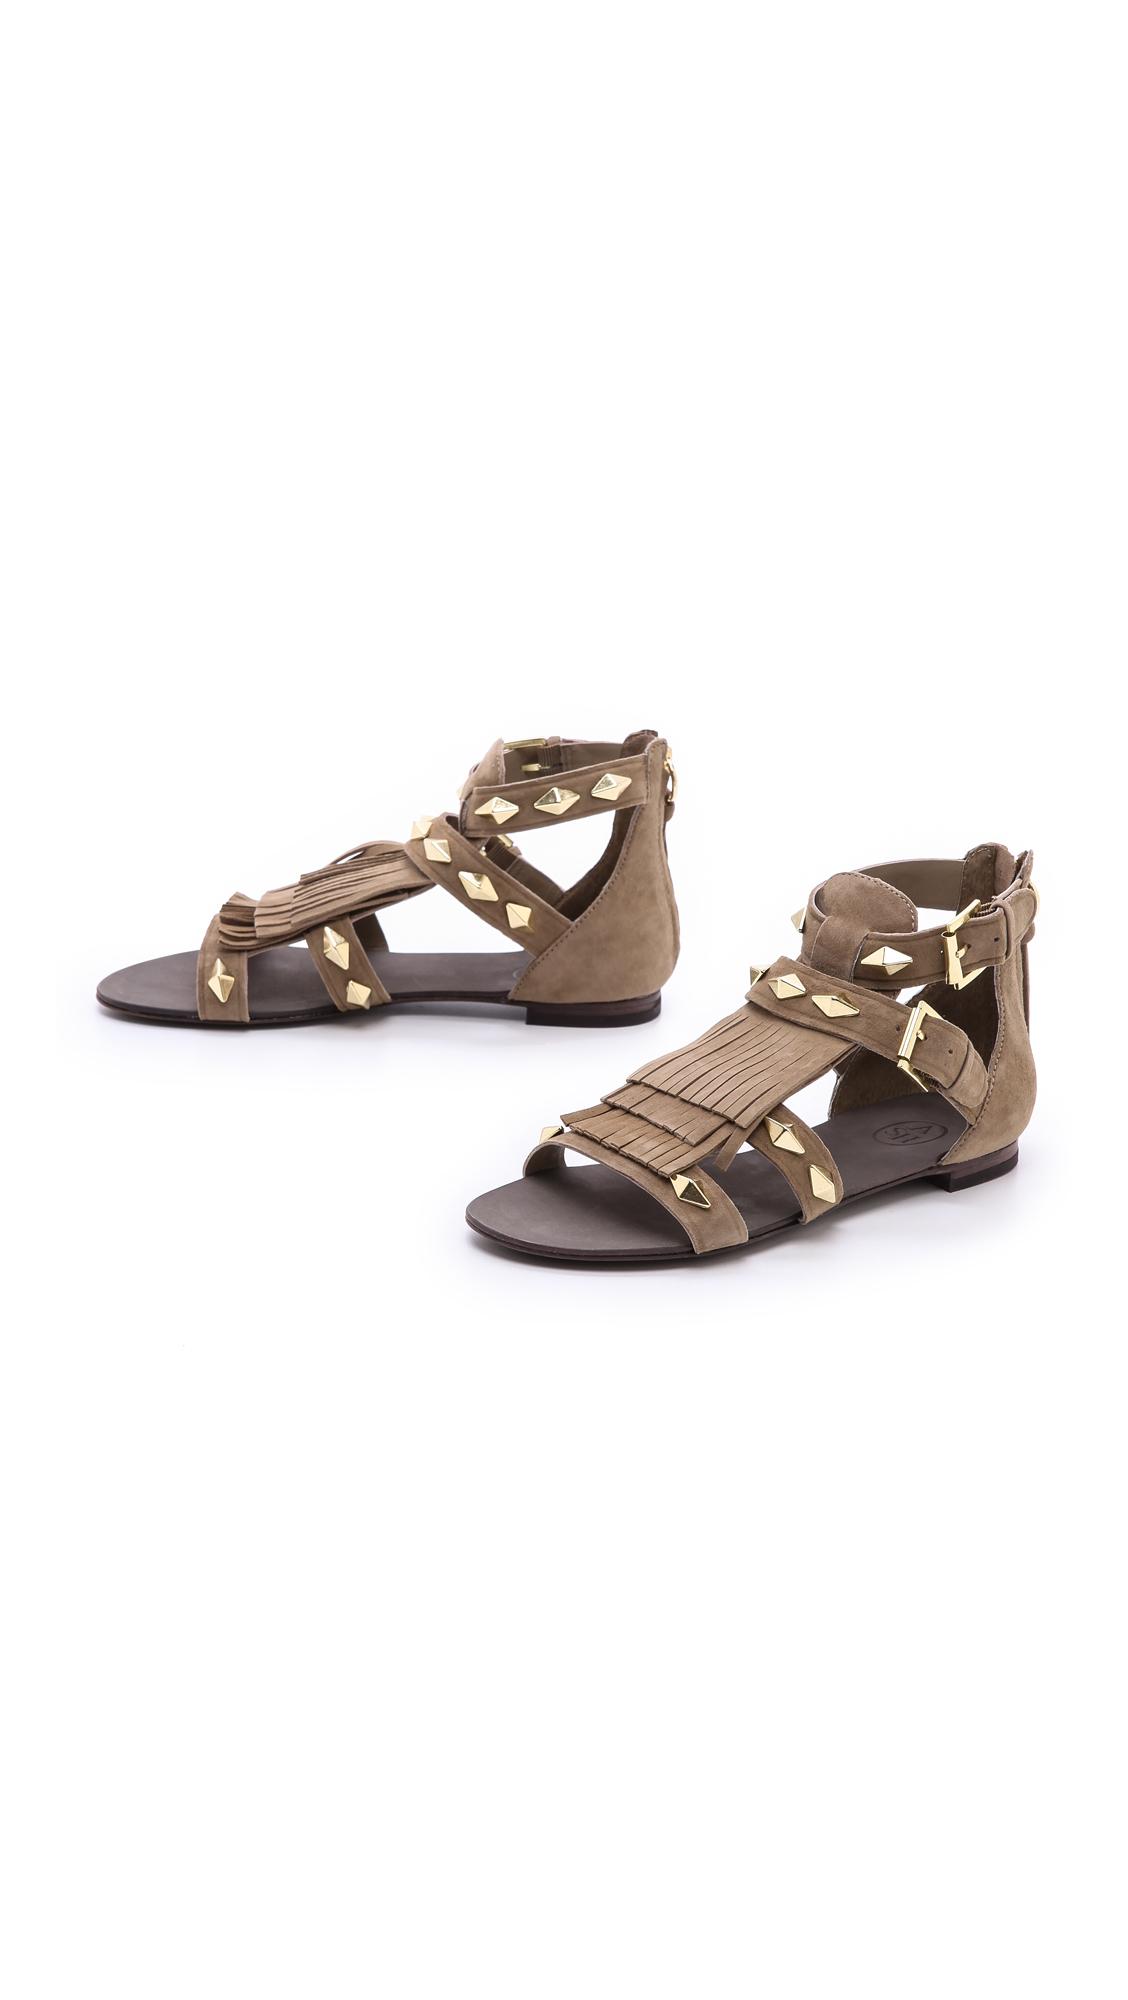 927fd9534 Lyst - Ash Mascara Fringe Flat Sandals in Gray